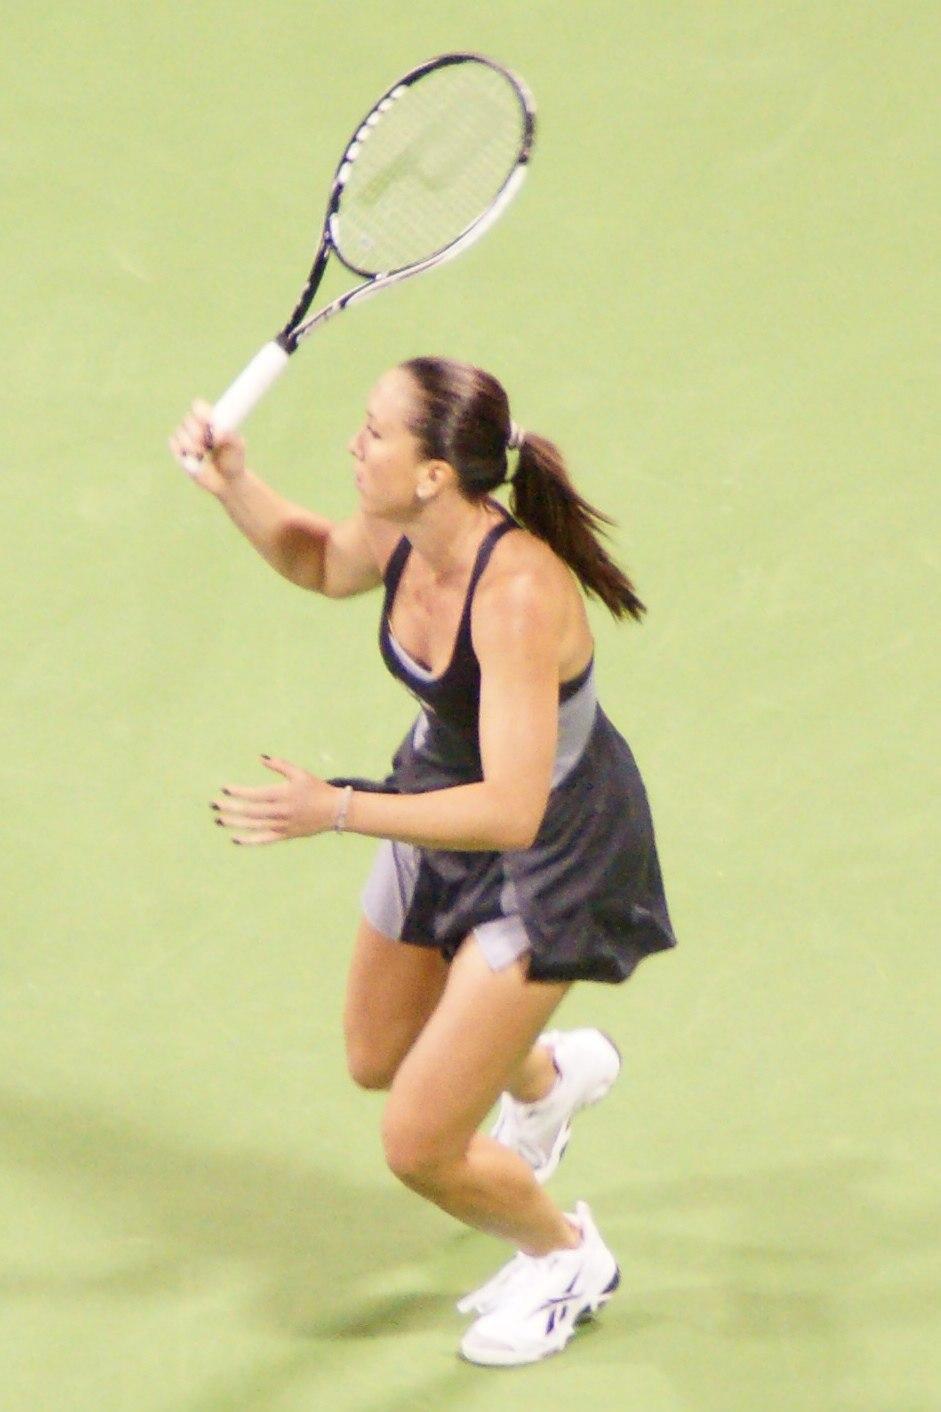 Jelena Jankovic at the 2008 WTA Tour Championships